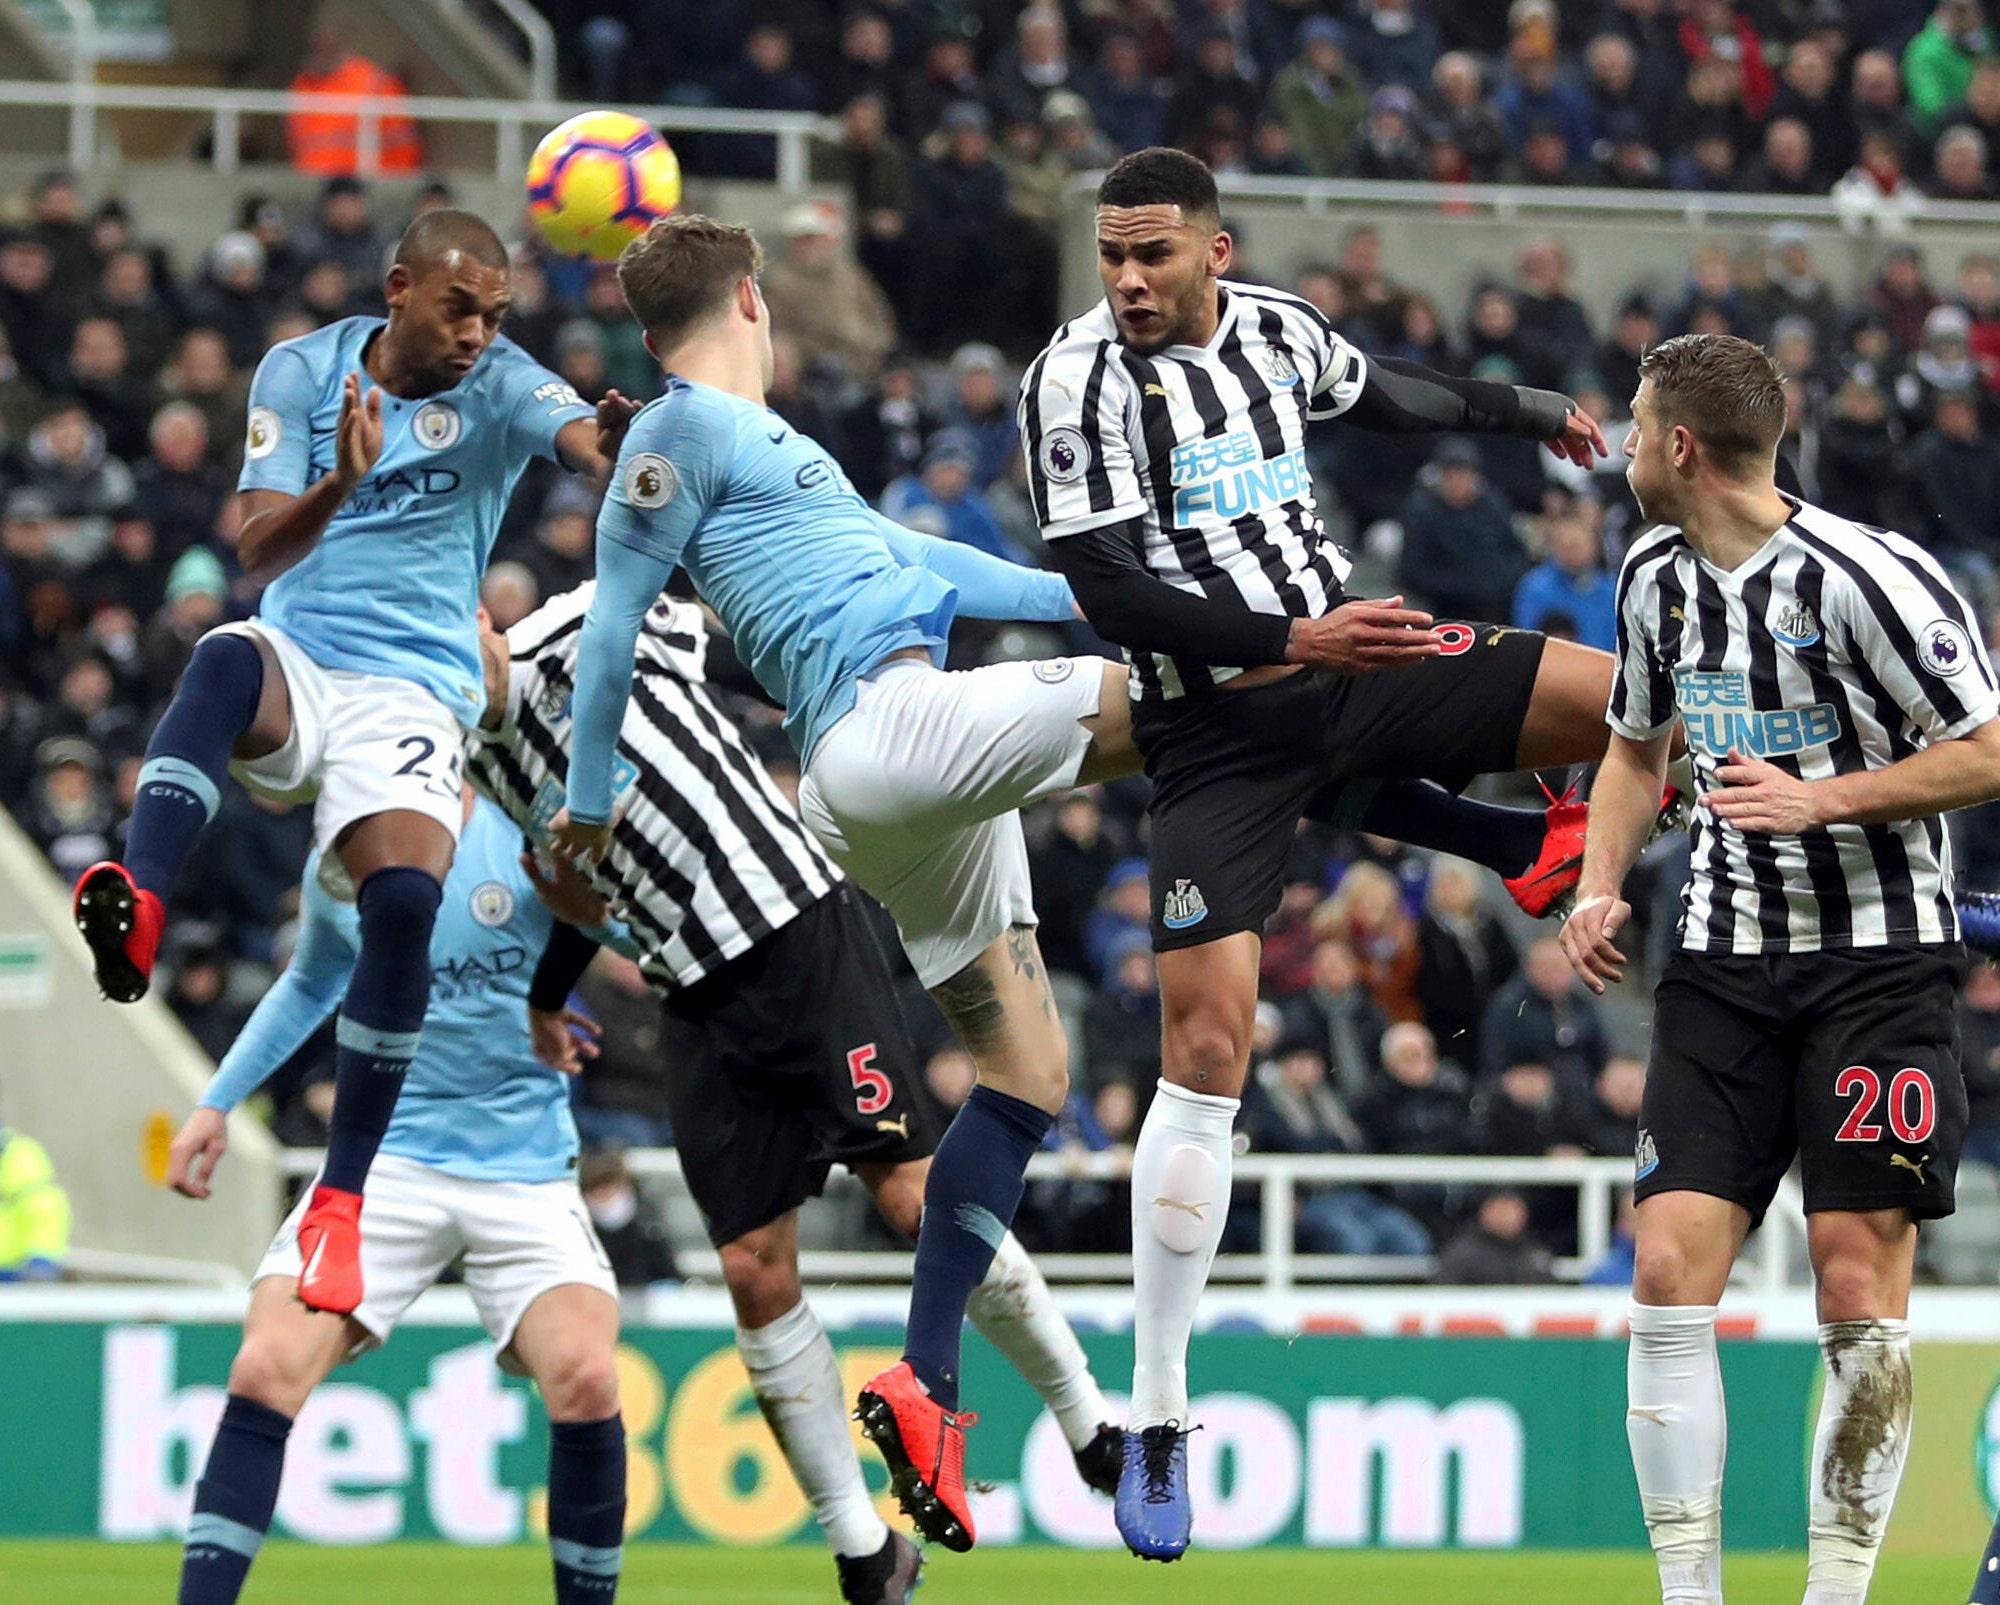 City loses at Newcastle, Solskjaer's winning run ends | FOX